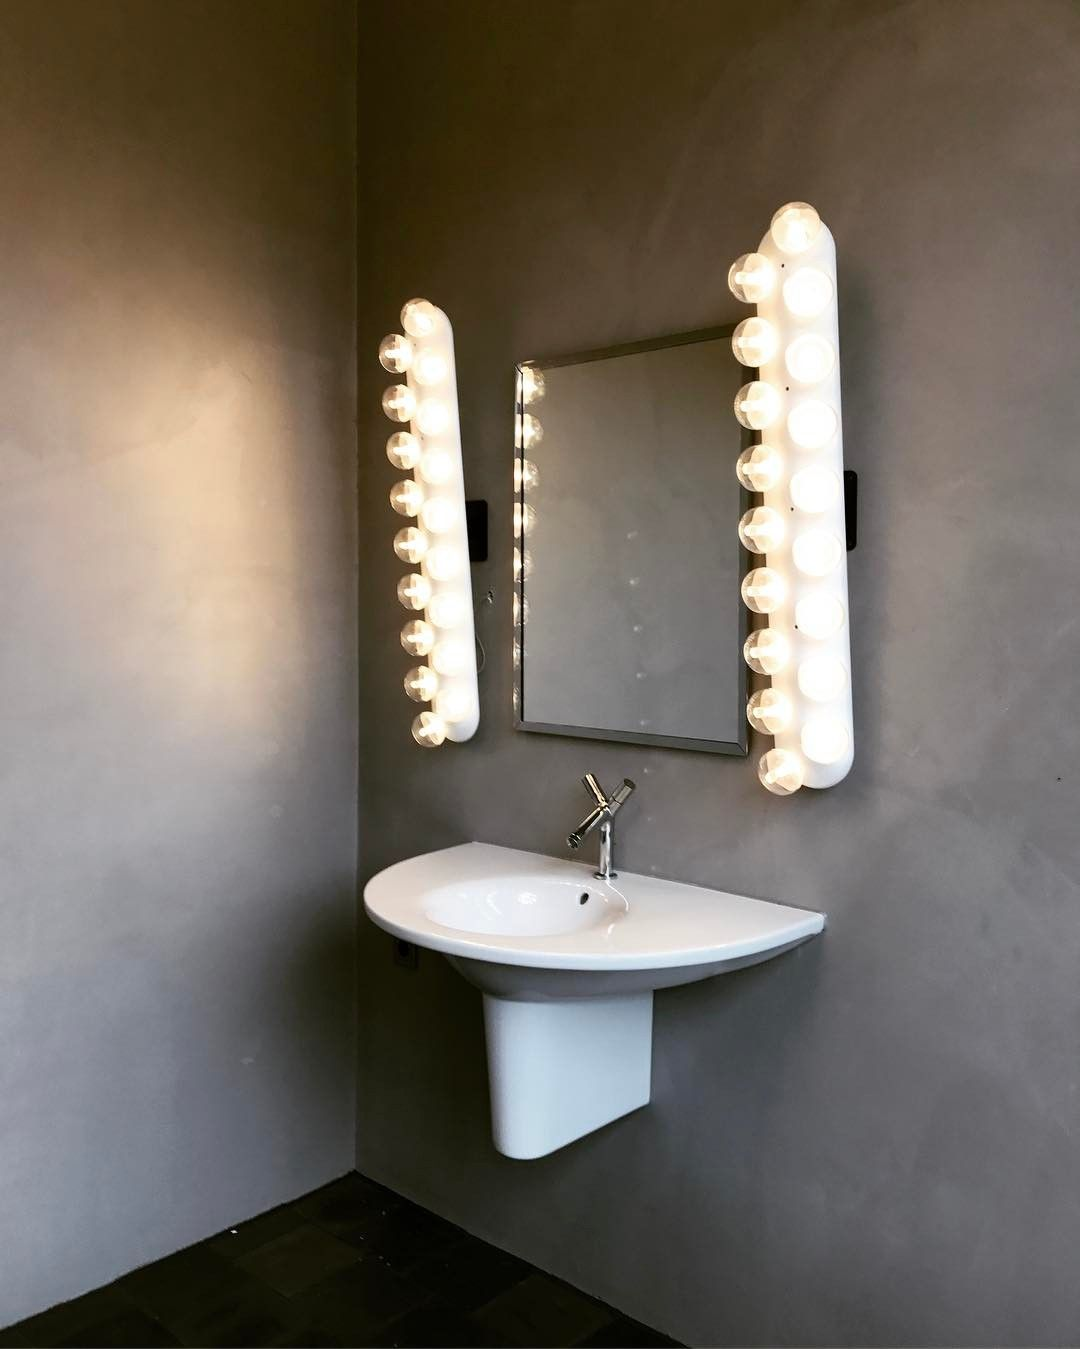 Prop light wall by bertjan pot via moooi ooi bathroom